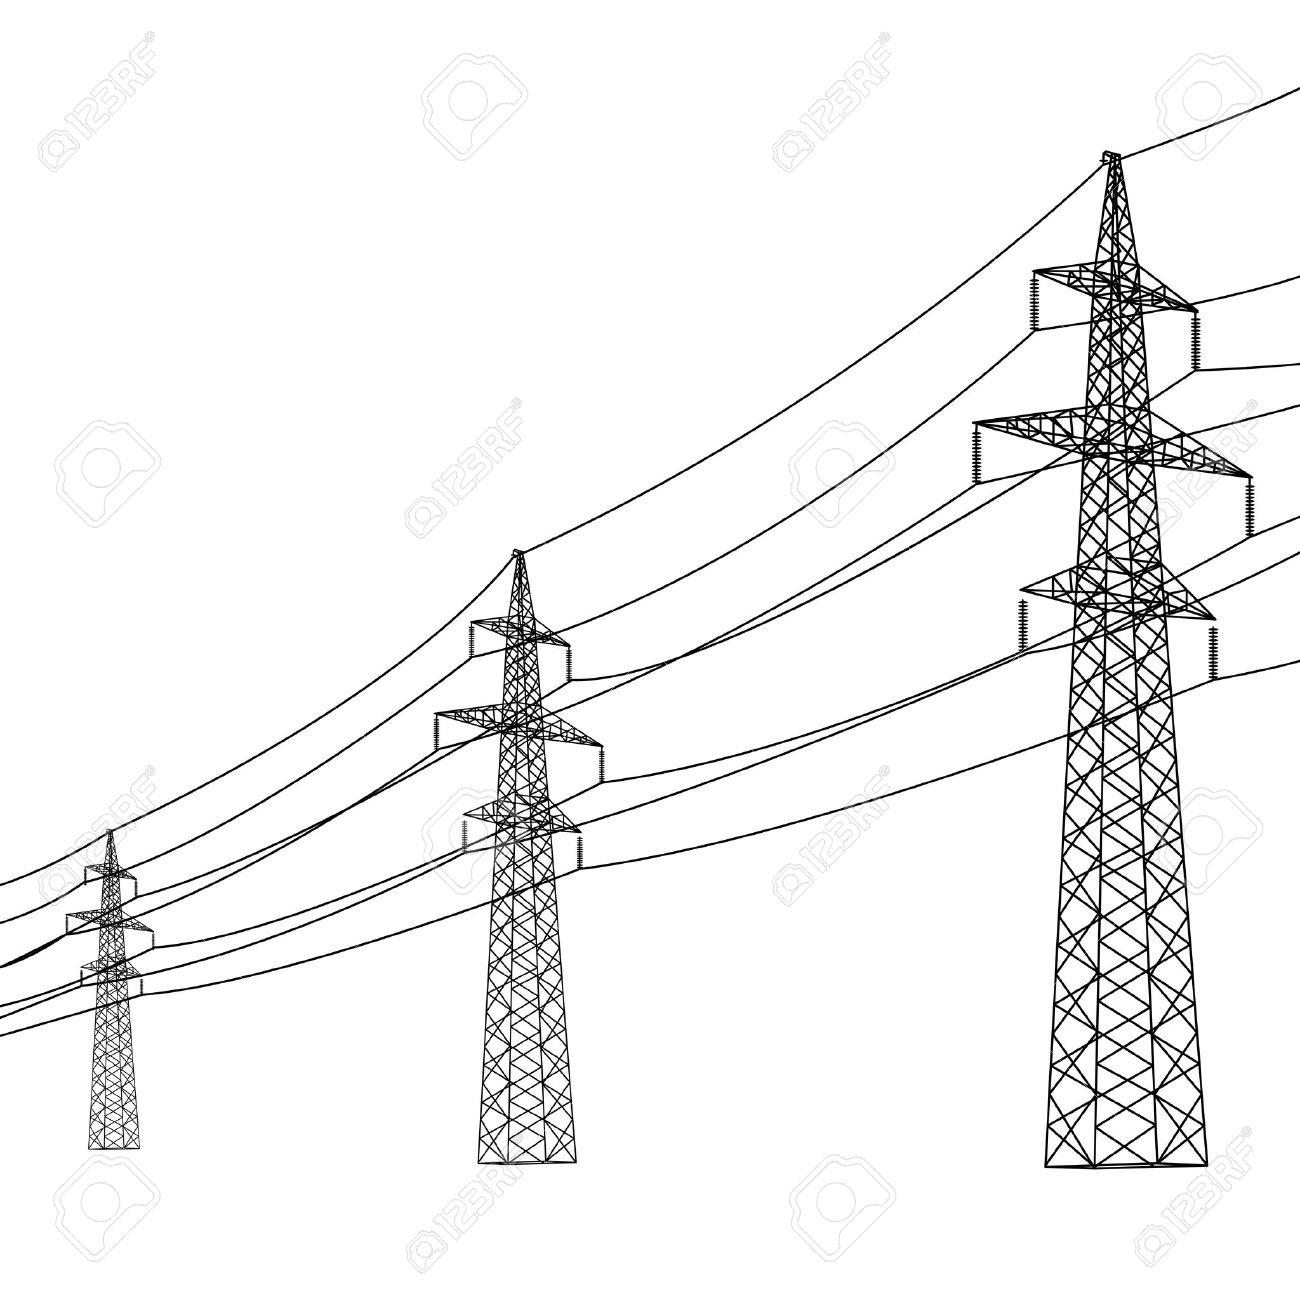 power line drawing at getdrawings com